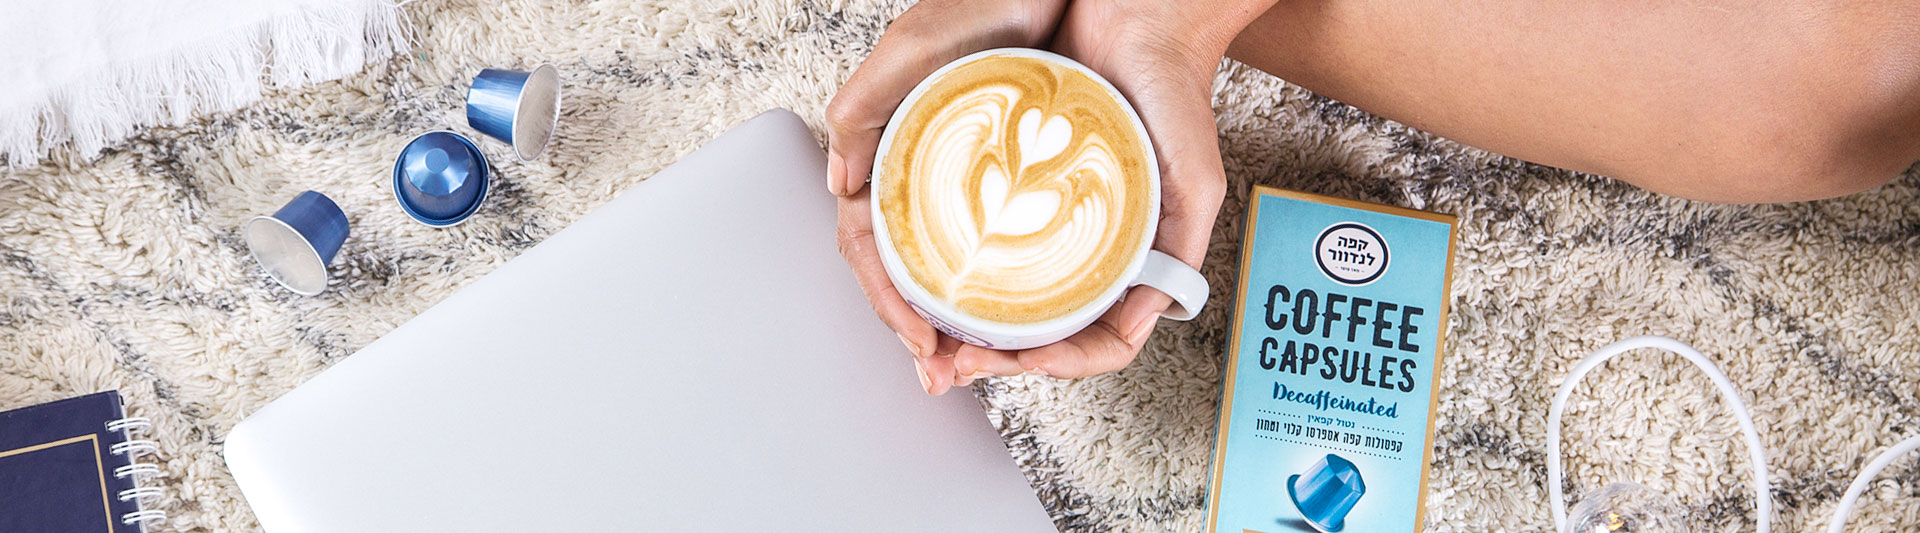 קפה נטול קפאין